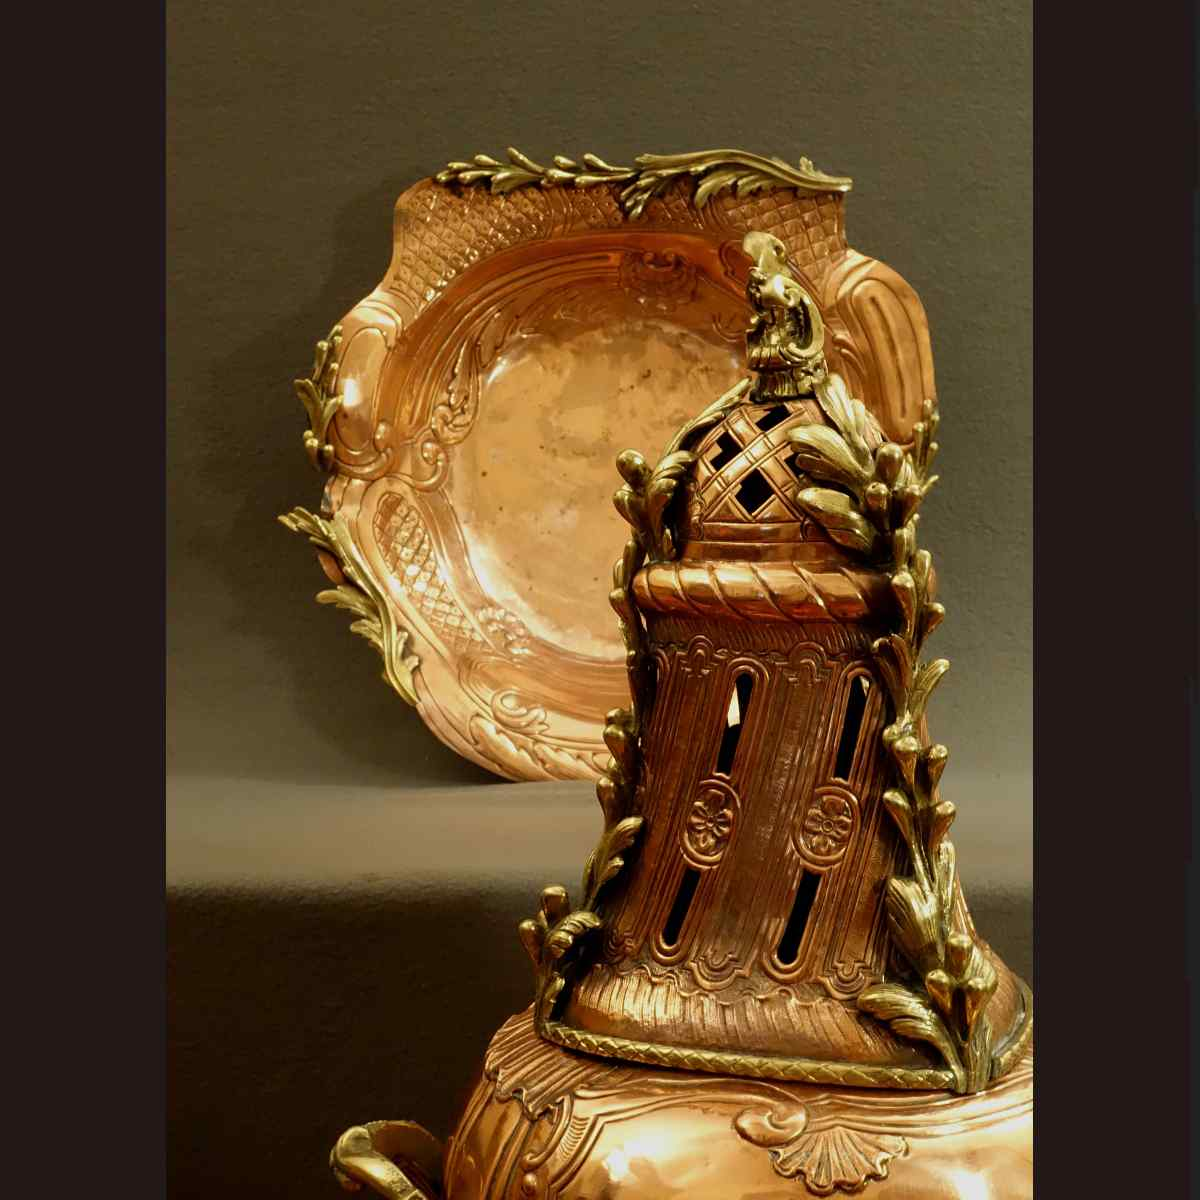 Rare Fontana Tabella - periodo Burns Profumo Regency